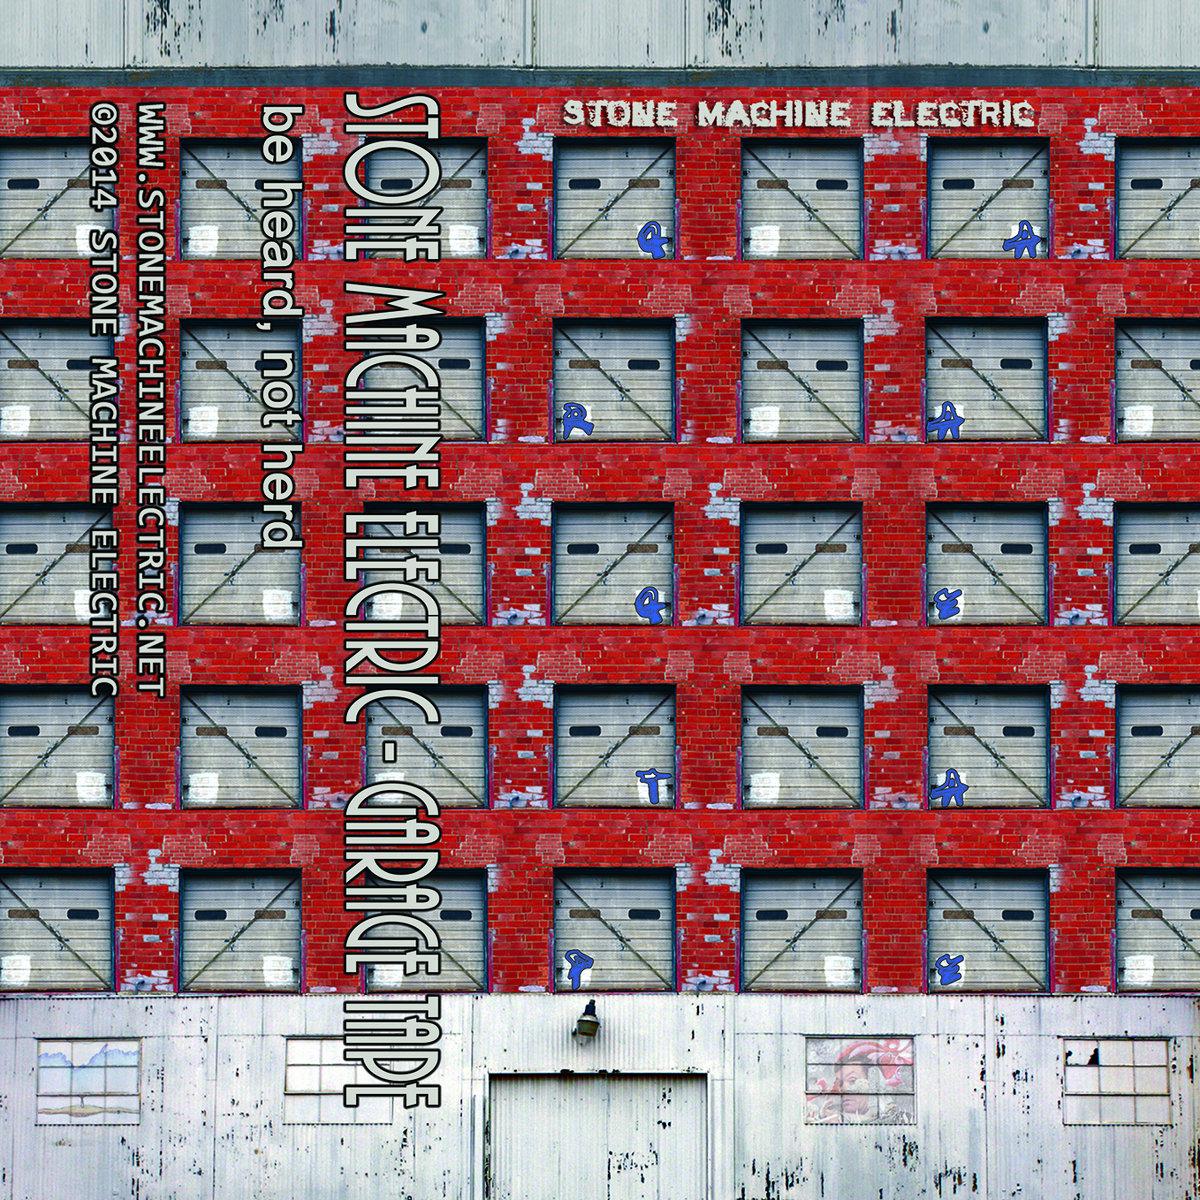 stone machine electric garage tape